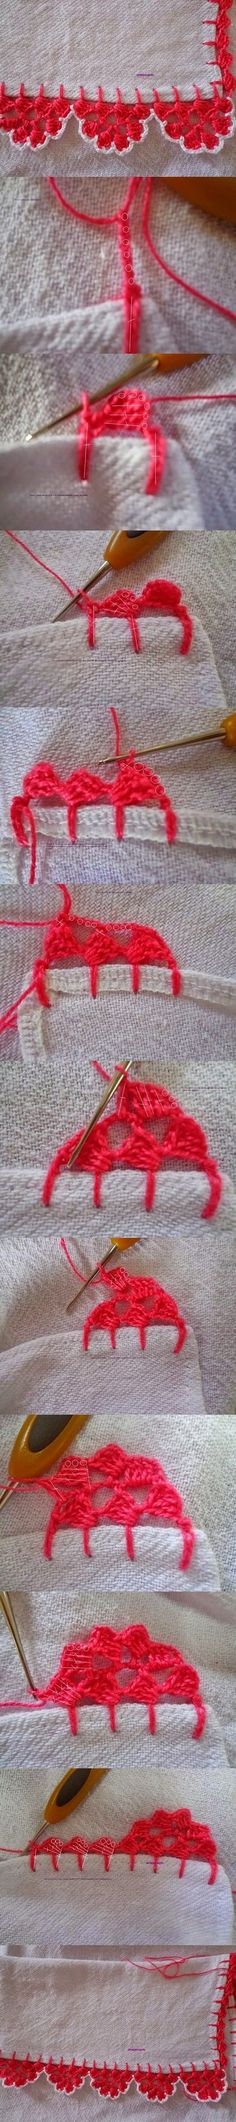 Cochet lacy beak, EASY, FAST, BEAUTIFUL !  #Tutorial--> http://wonderfuldiy.com/wonderful-diy-pretty-crochet-lacy-beak/ #diy #crochet: